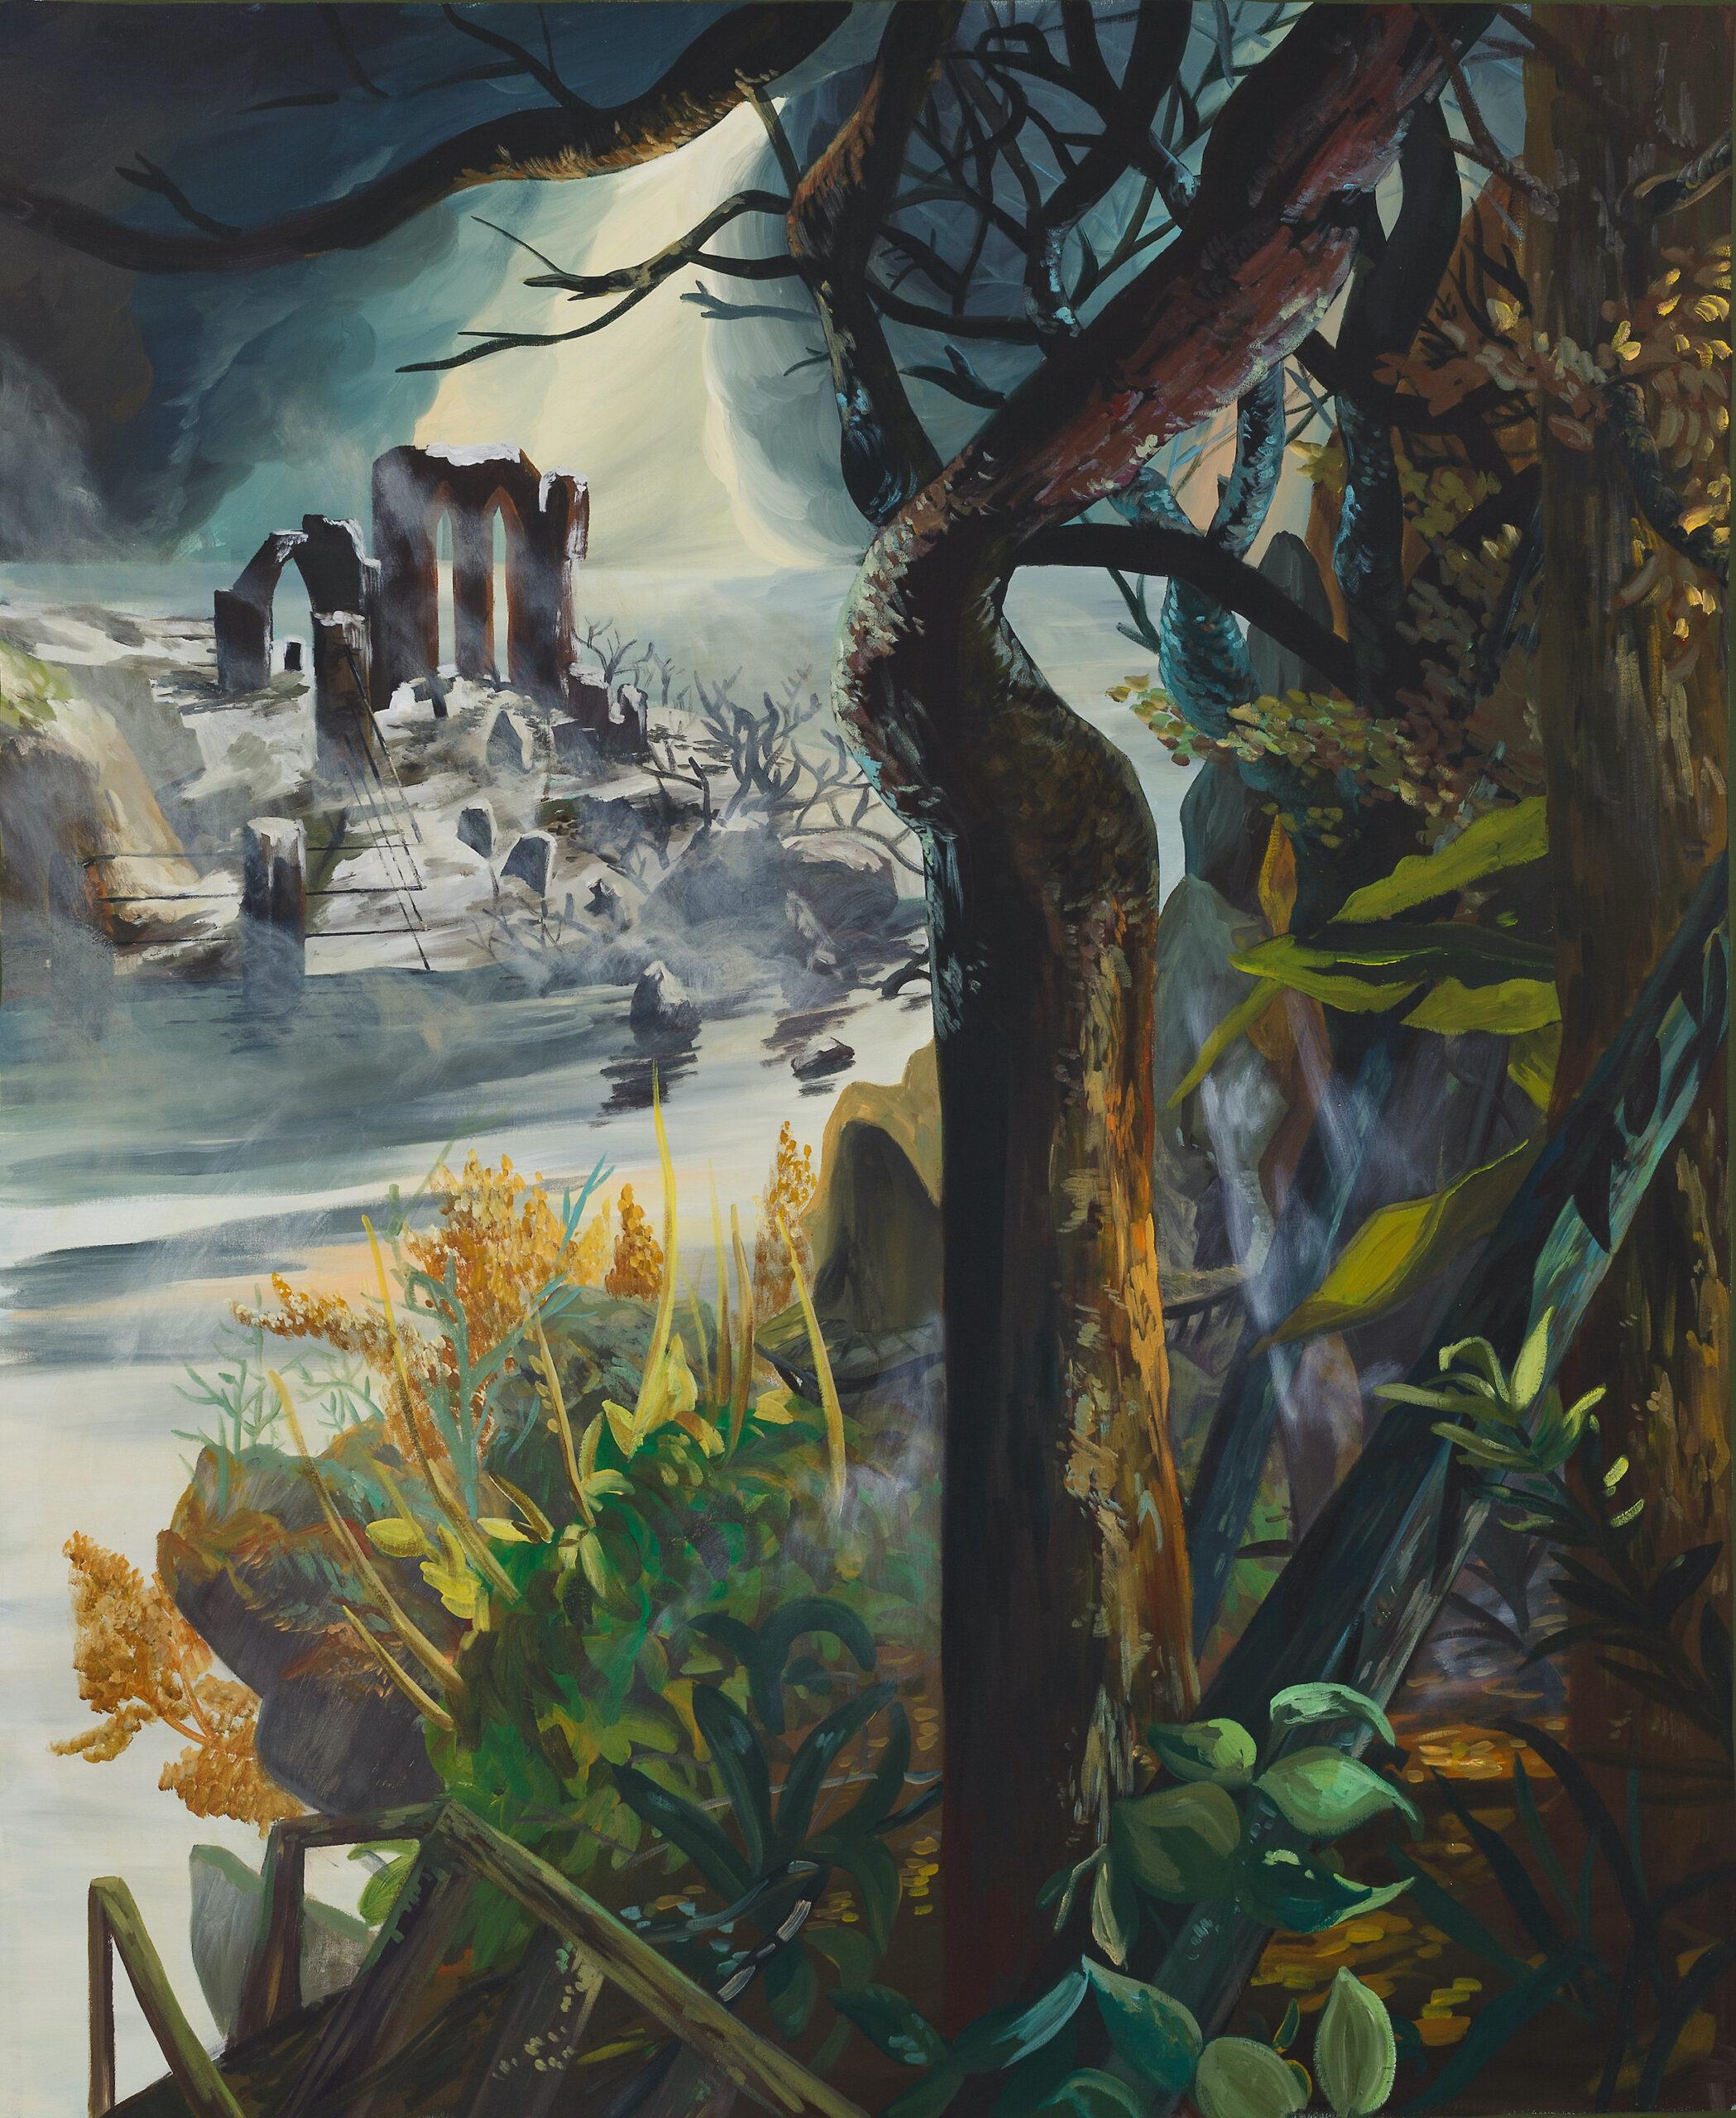 Ernesto Gutierrez Moya, I Found the Island (Panel 3 of 3), 2021